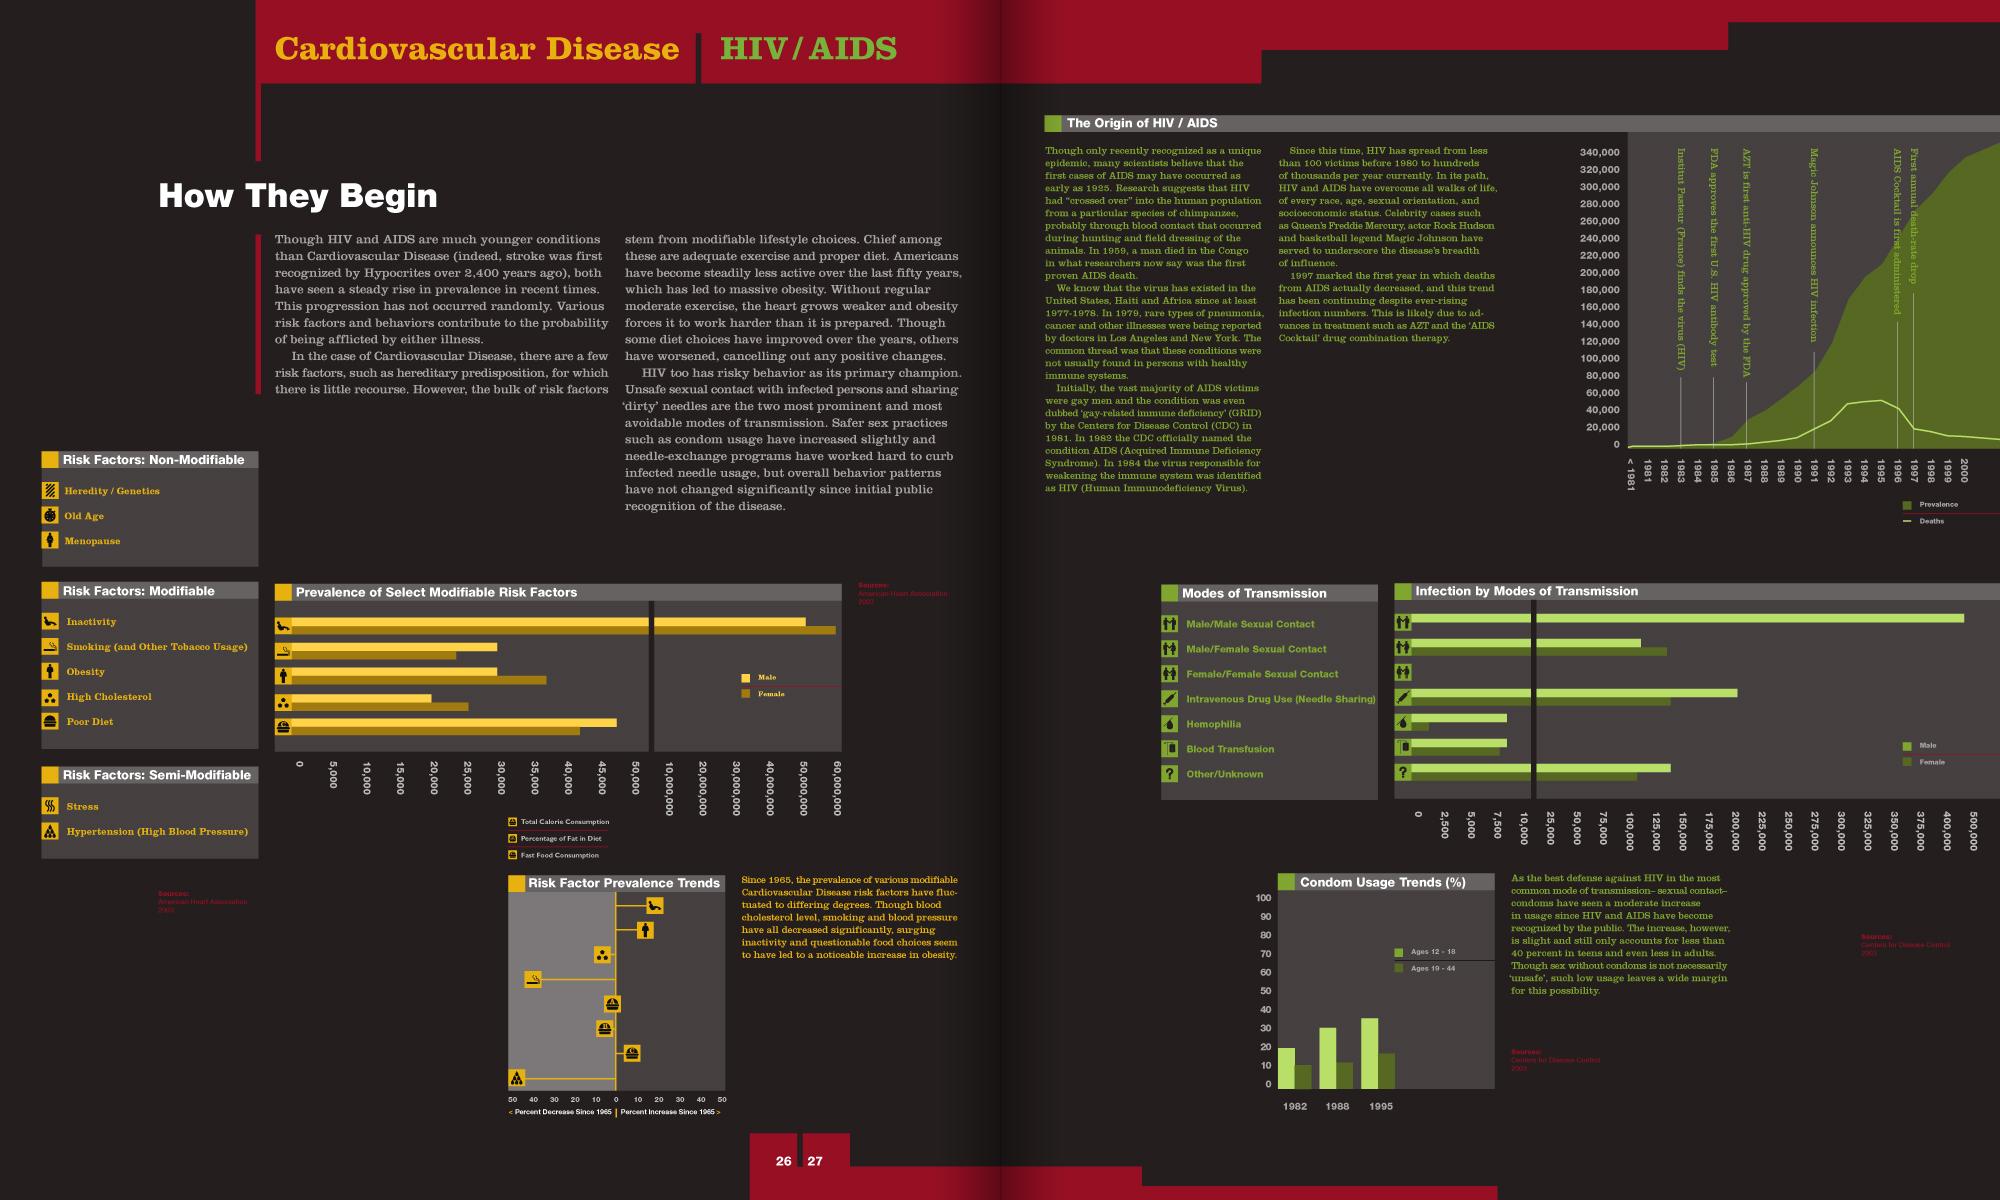 magazine article segment comparing risk factors of Cardiovascular Disease vs. HIV/AIDS